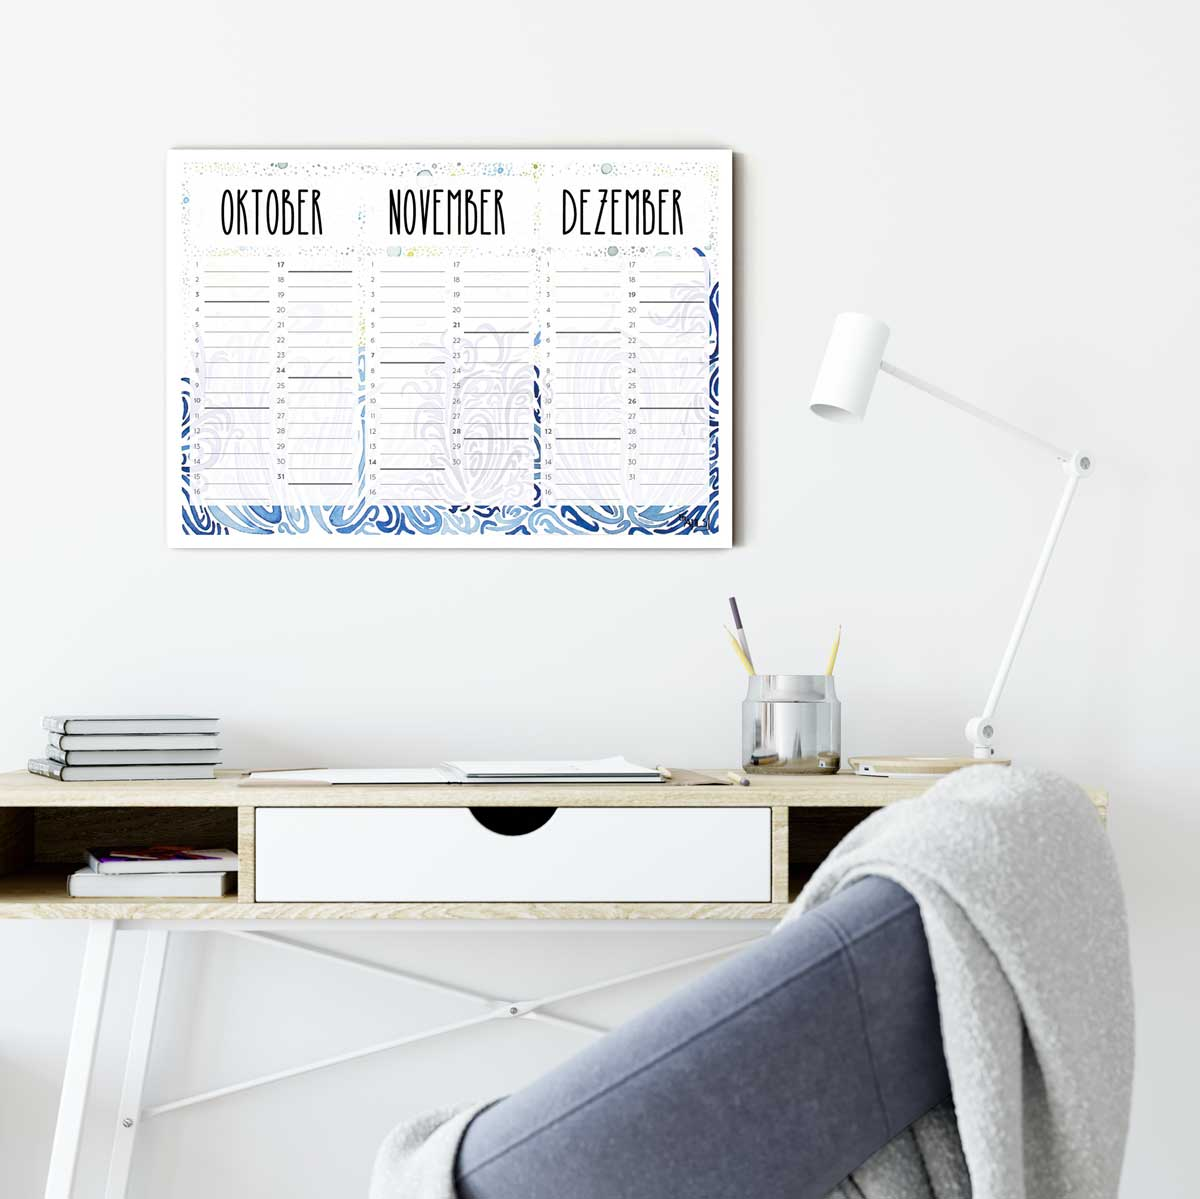 kalender-zum-ausdrucken-oktober-november-dezember